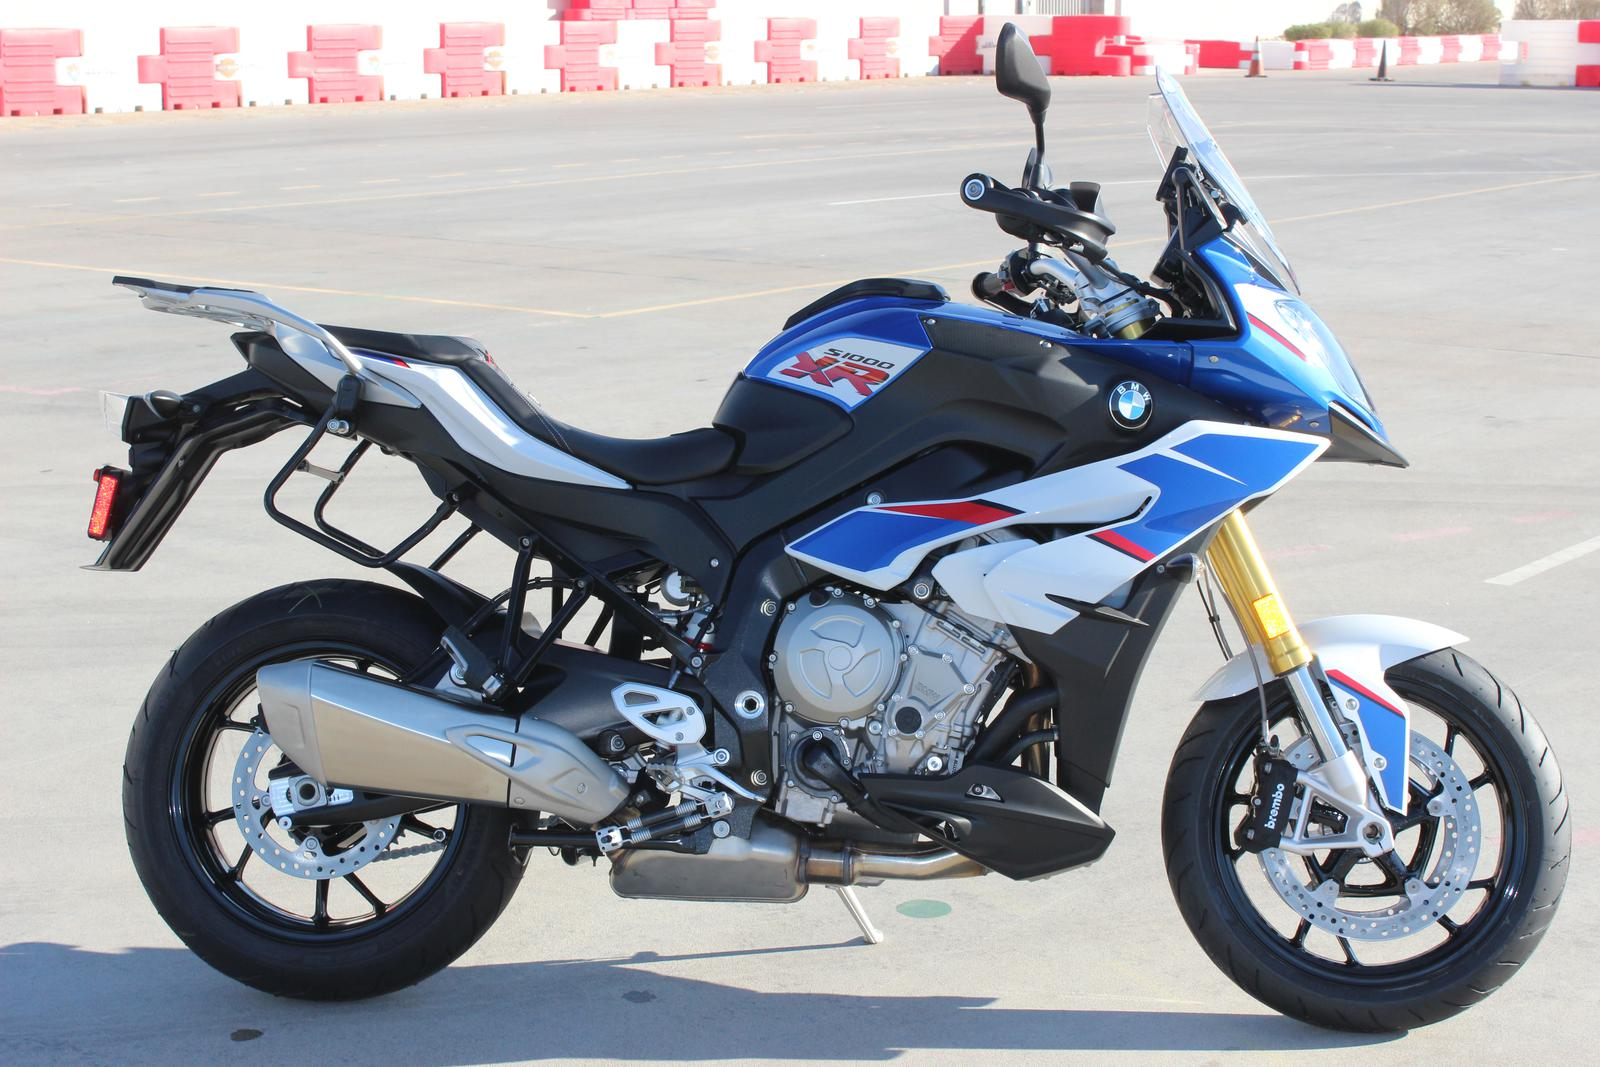 2018 bmw s 1000 xr for sale in scottsdale, az | go az motorcycles